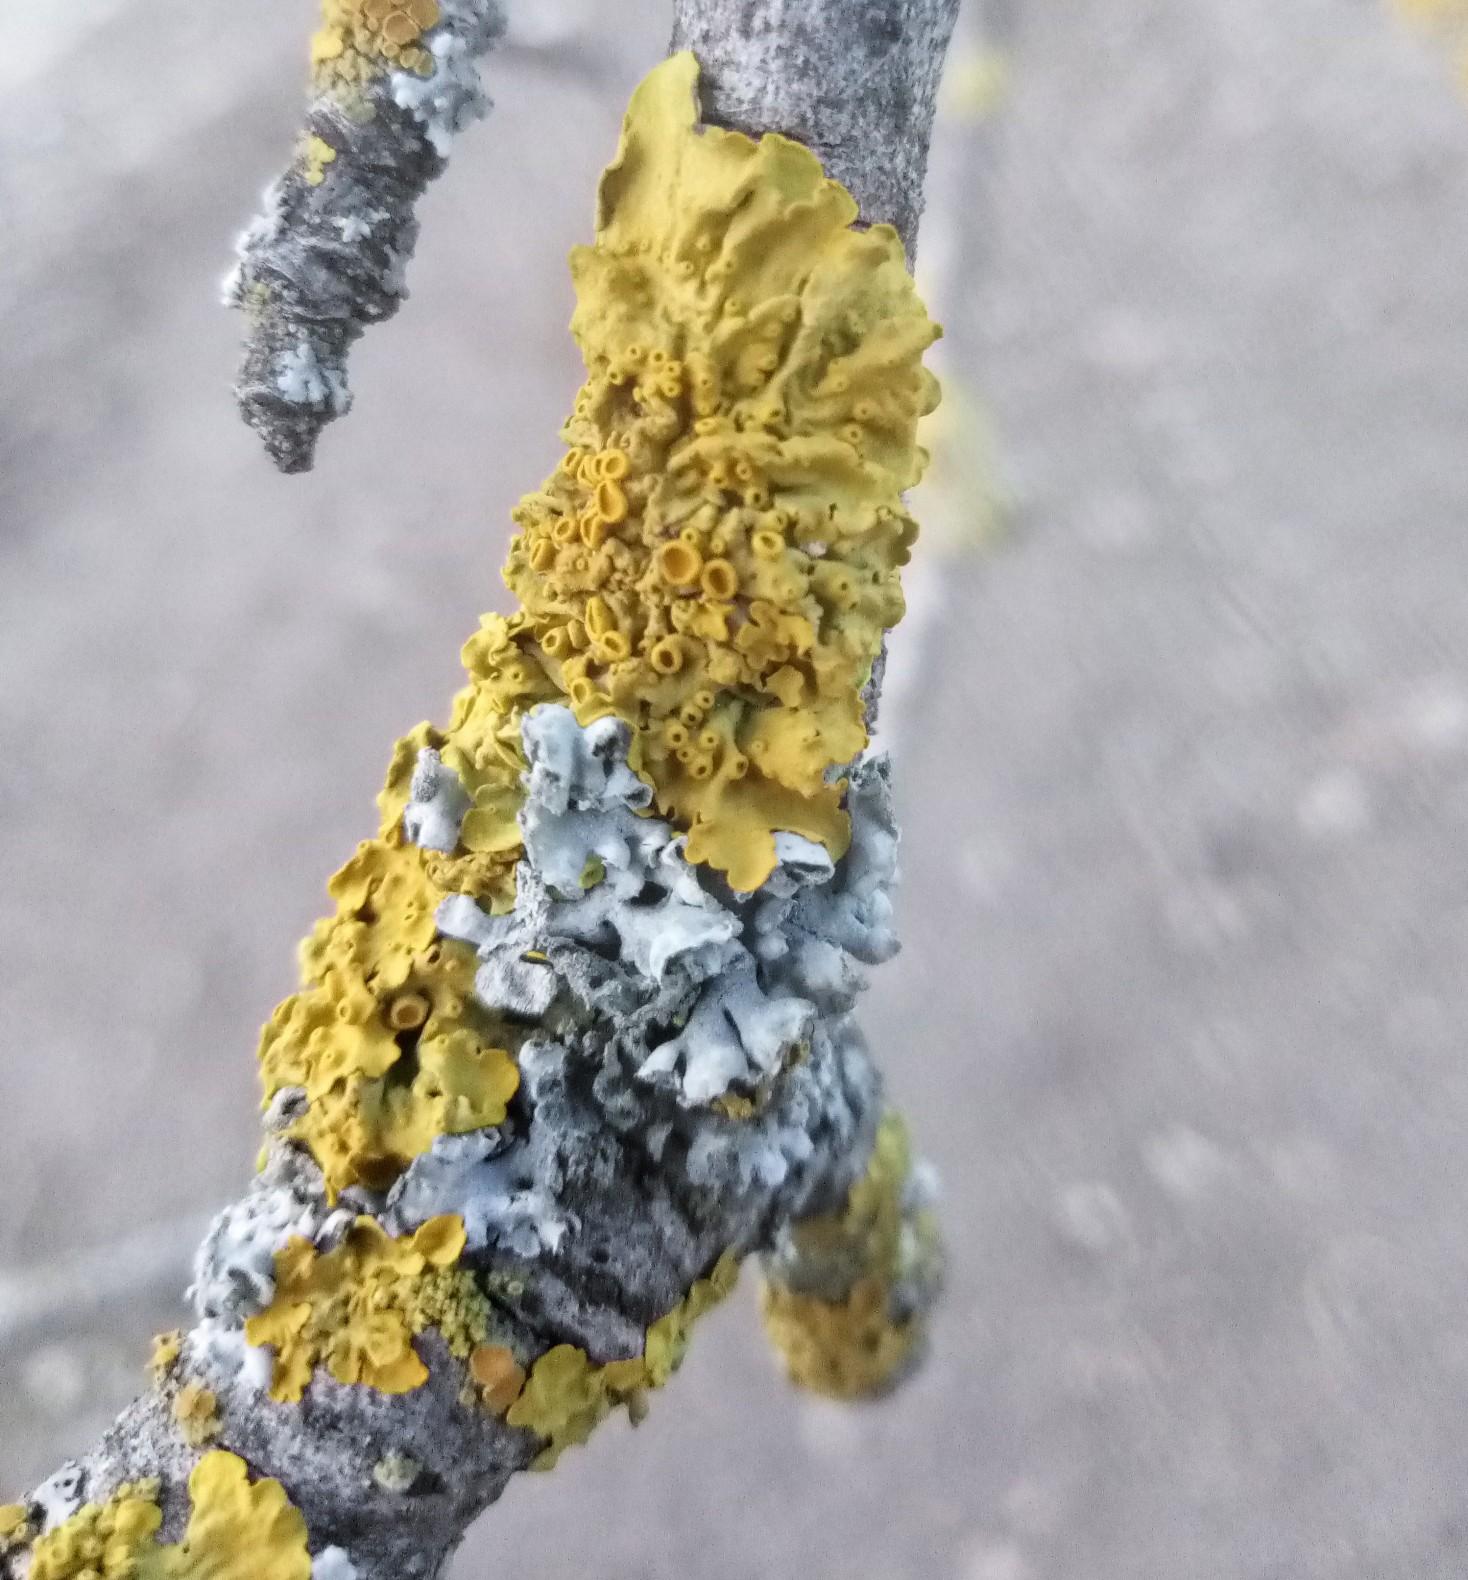 Tree fungus photo